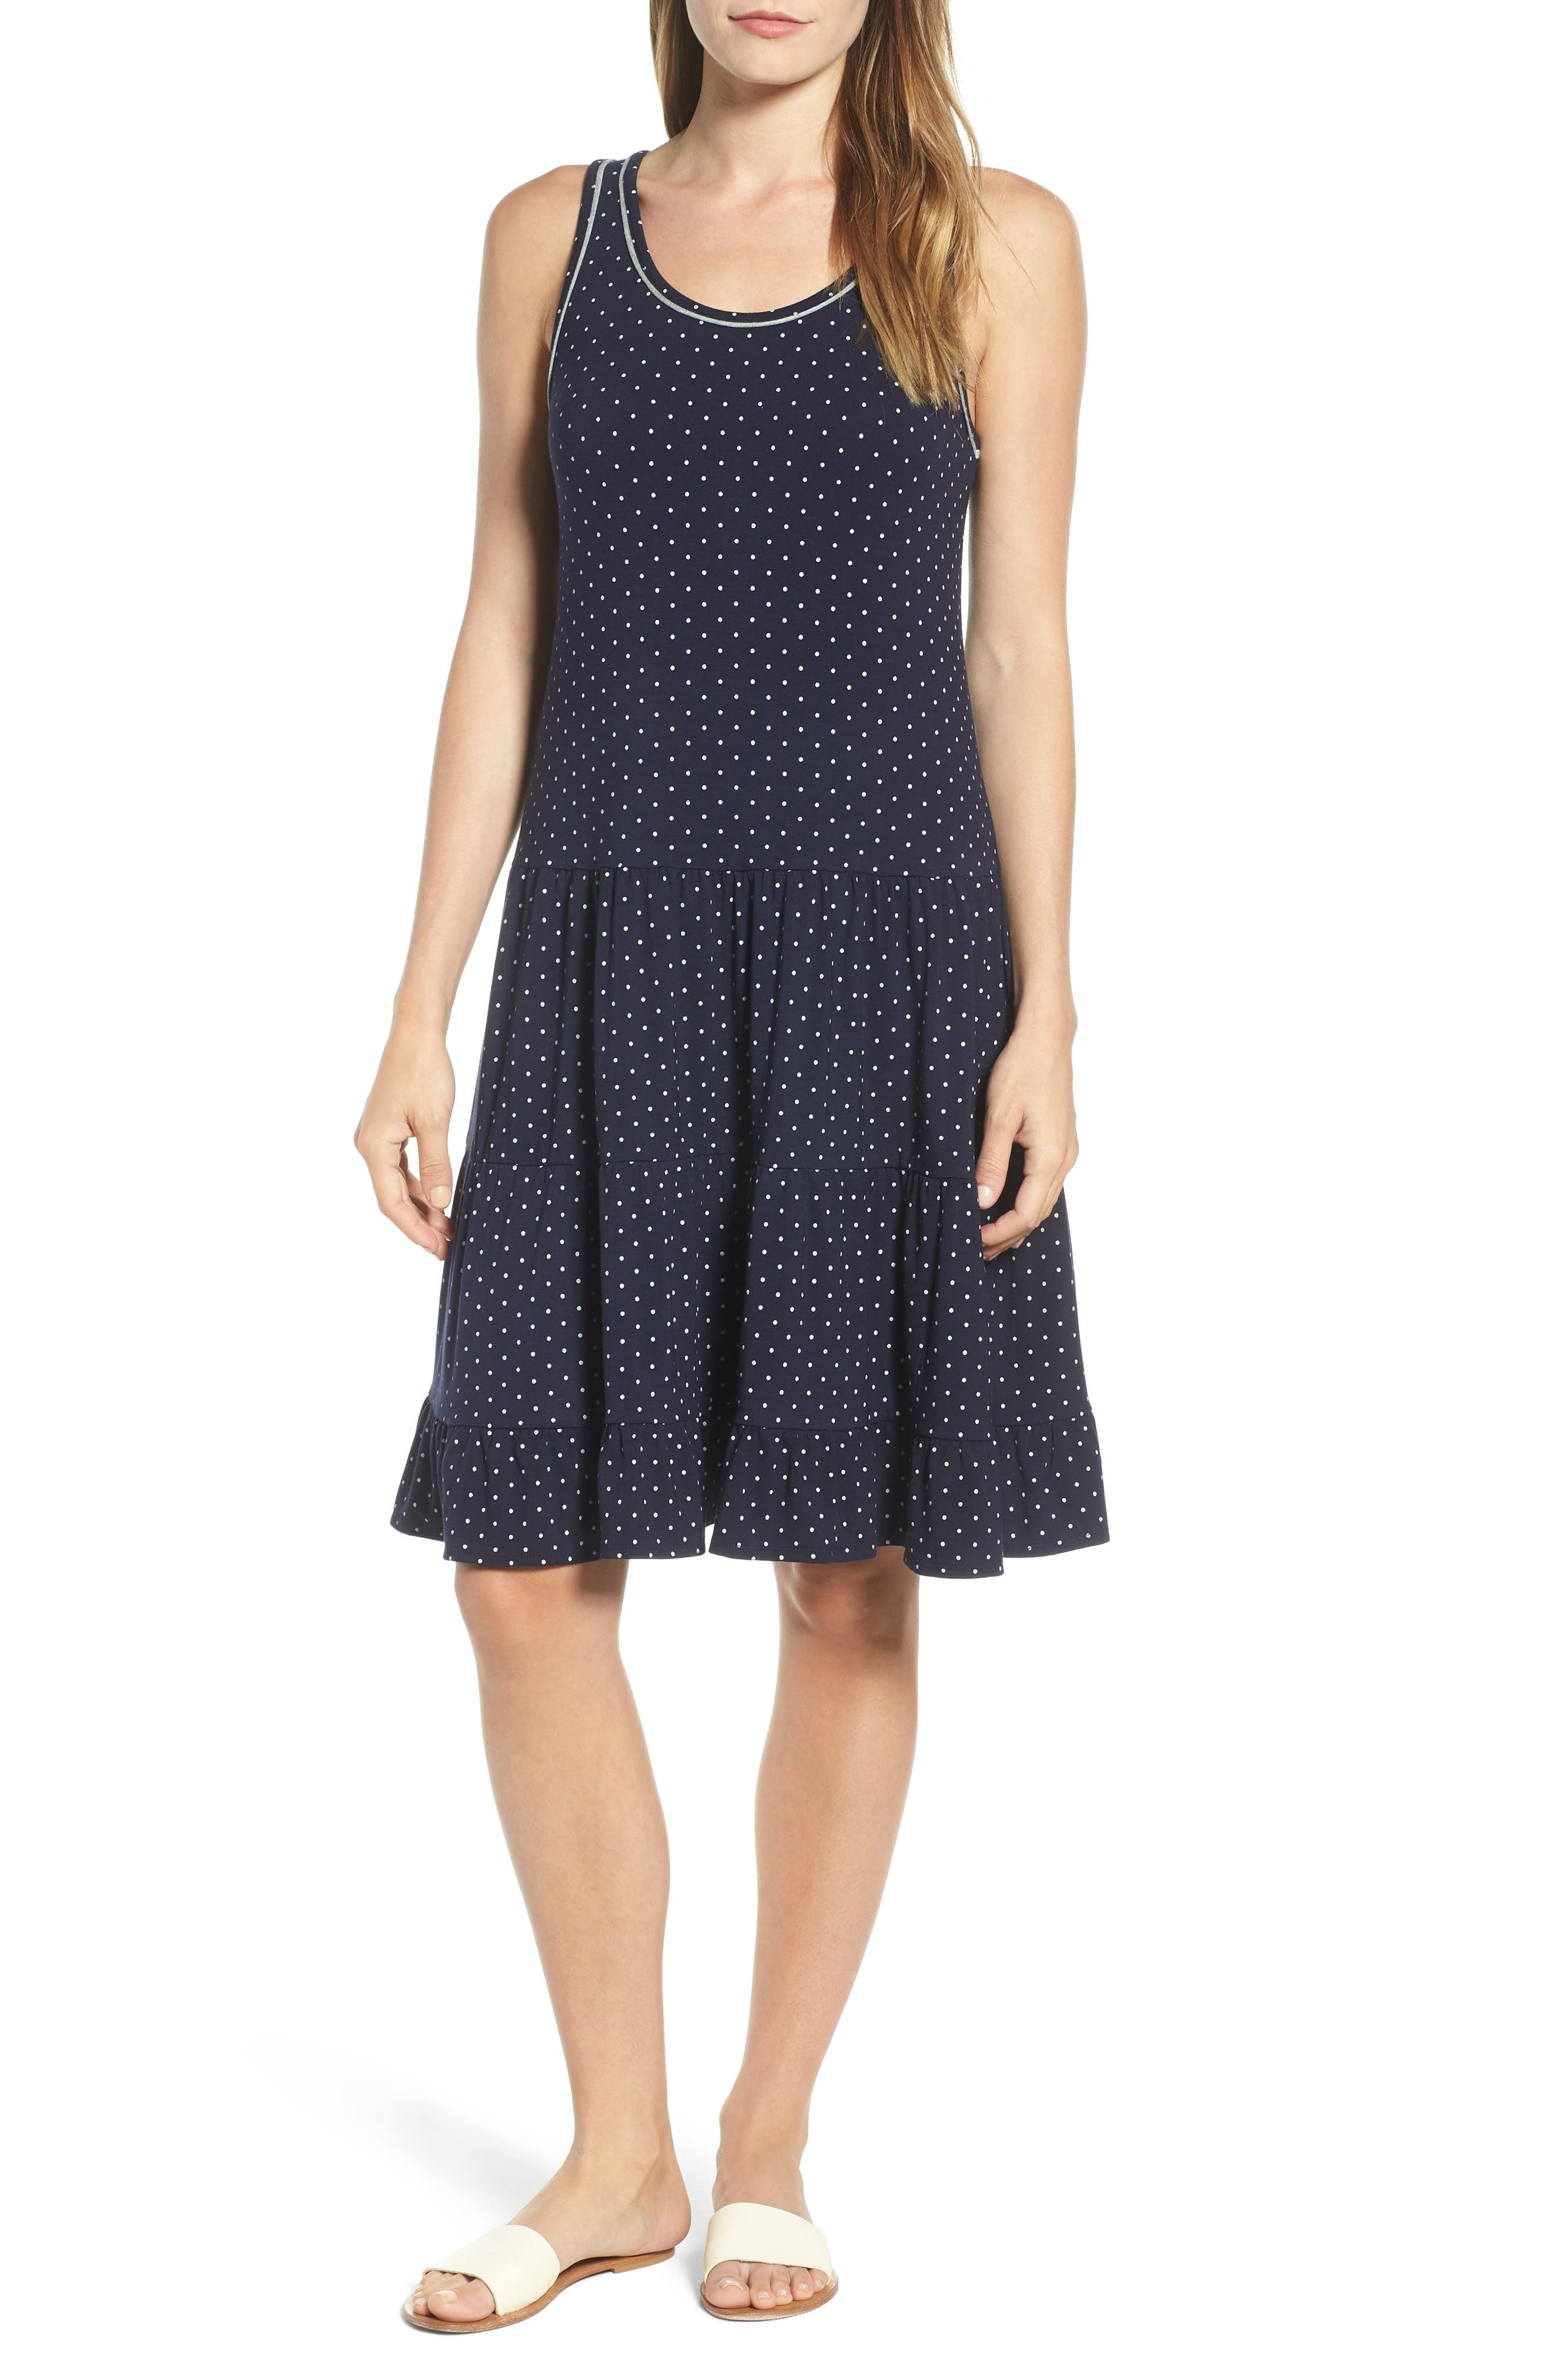 WIT & WISDOM Polka Dot Tiered Tank Dress, Main, color, 400